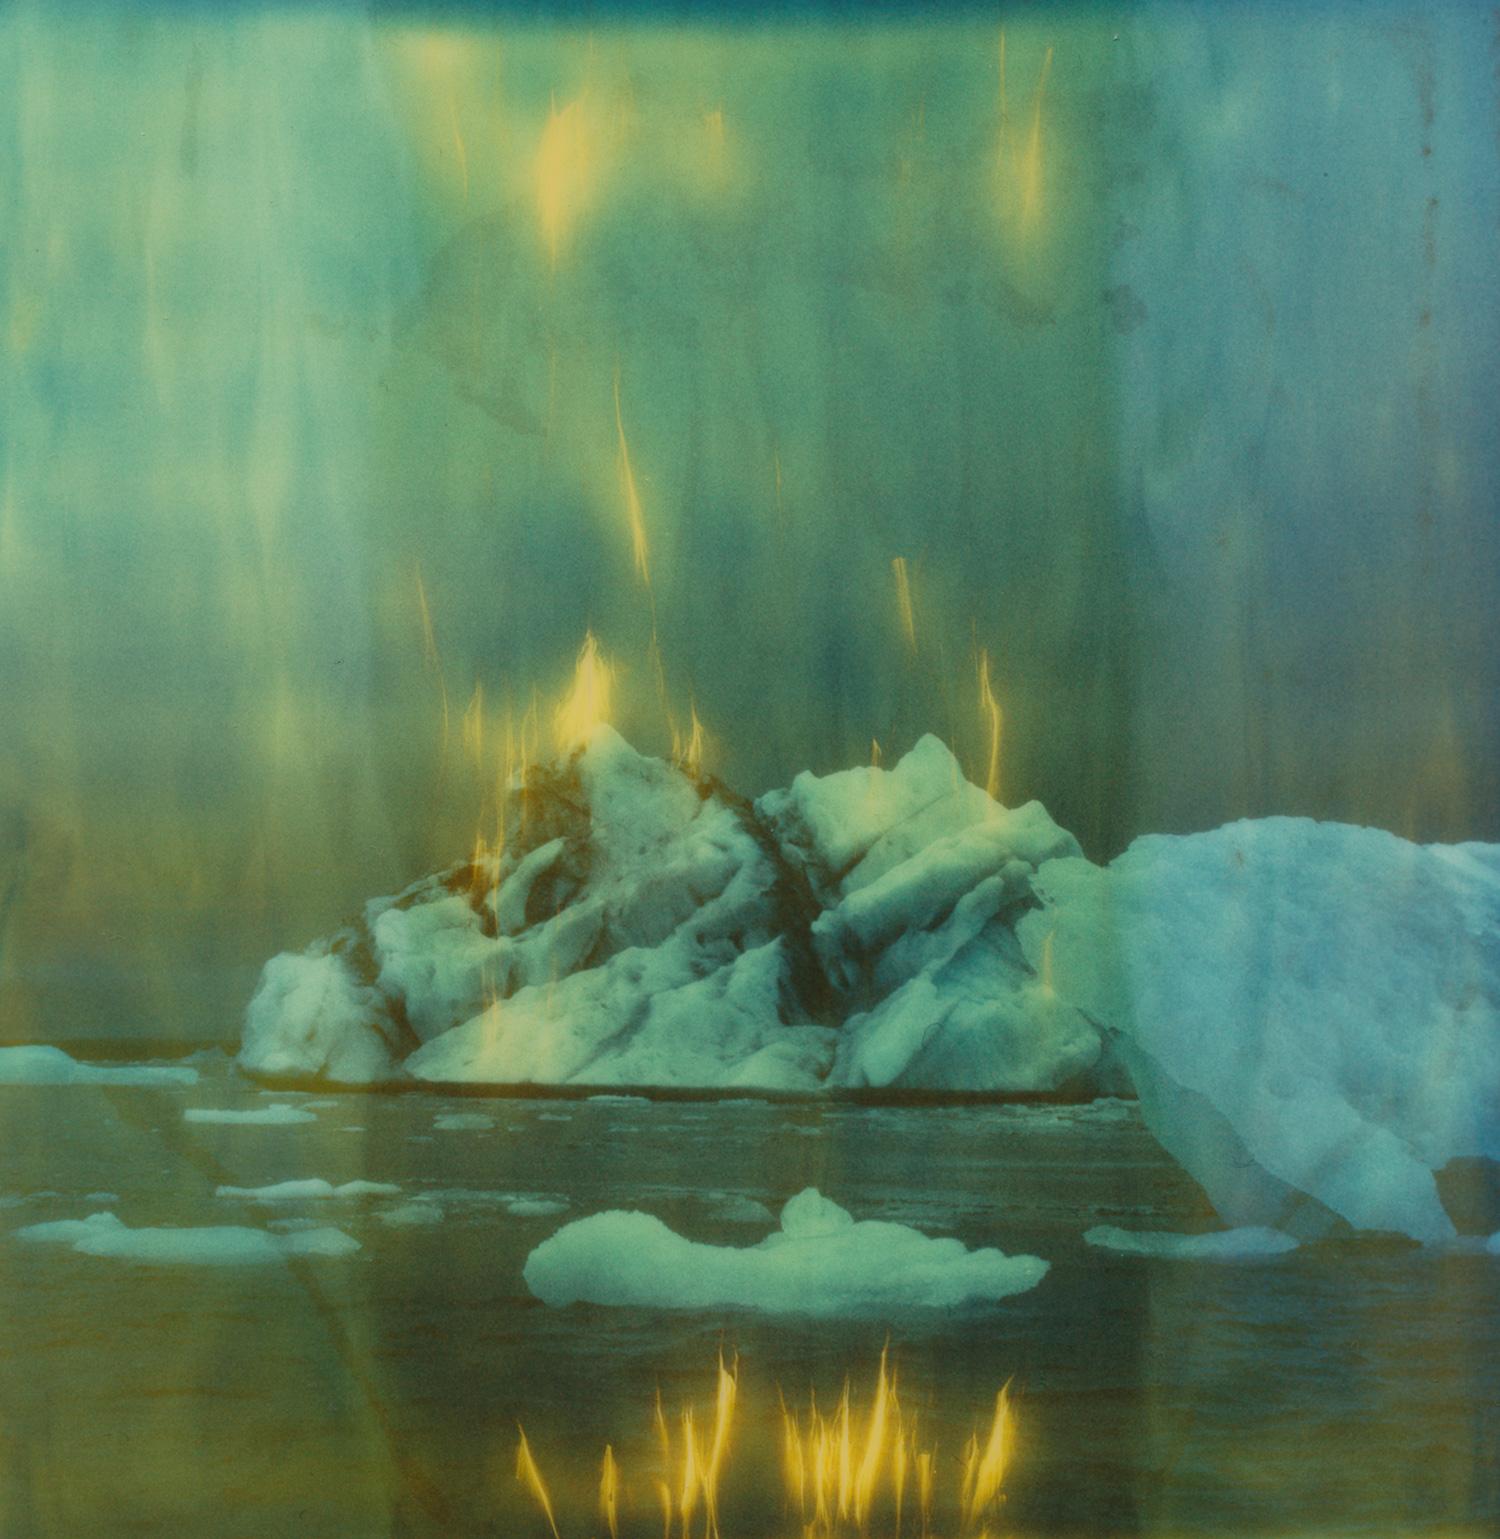 """Burning Down The Ice"" by  Jennifer Rumbach  | Polaroid SX-70 + Expired Polaroid Time Zero Film"